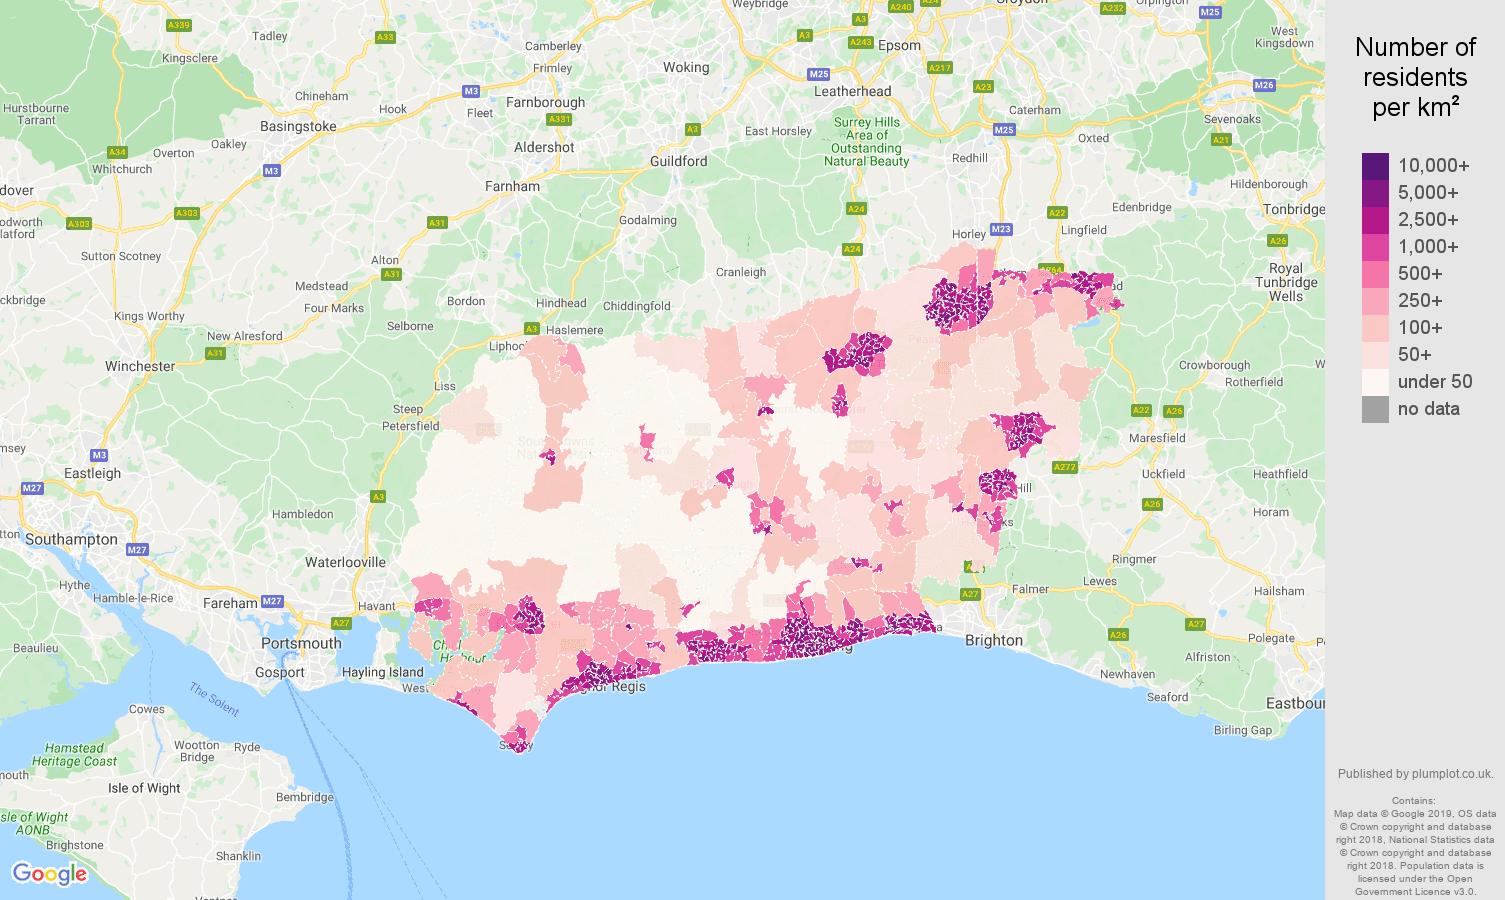 West Sussex population density map